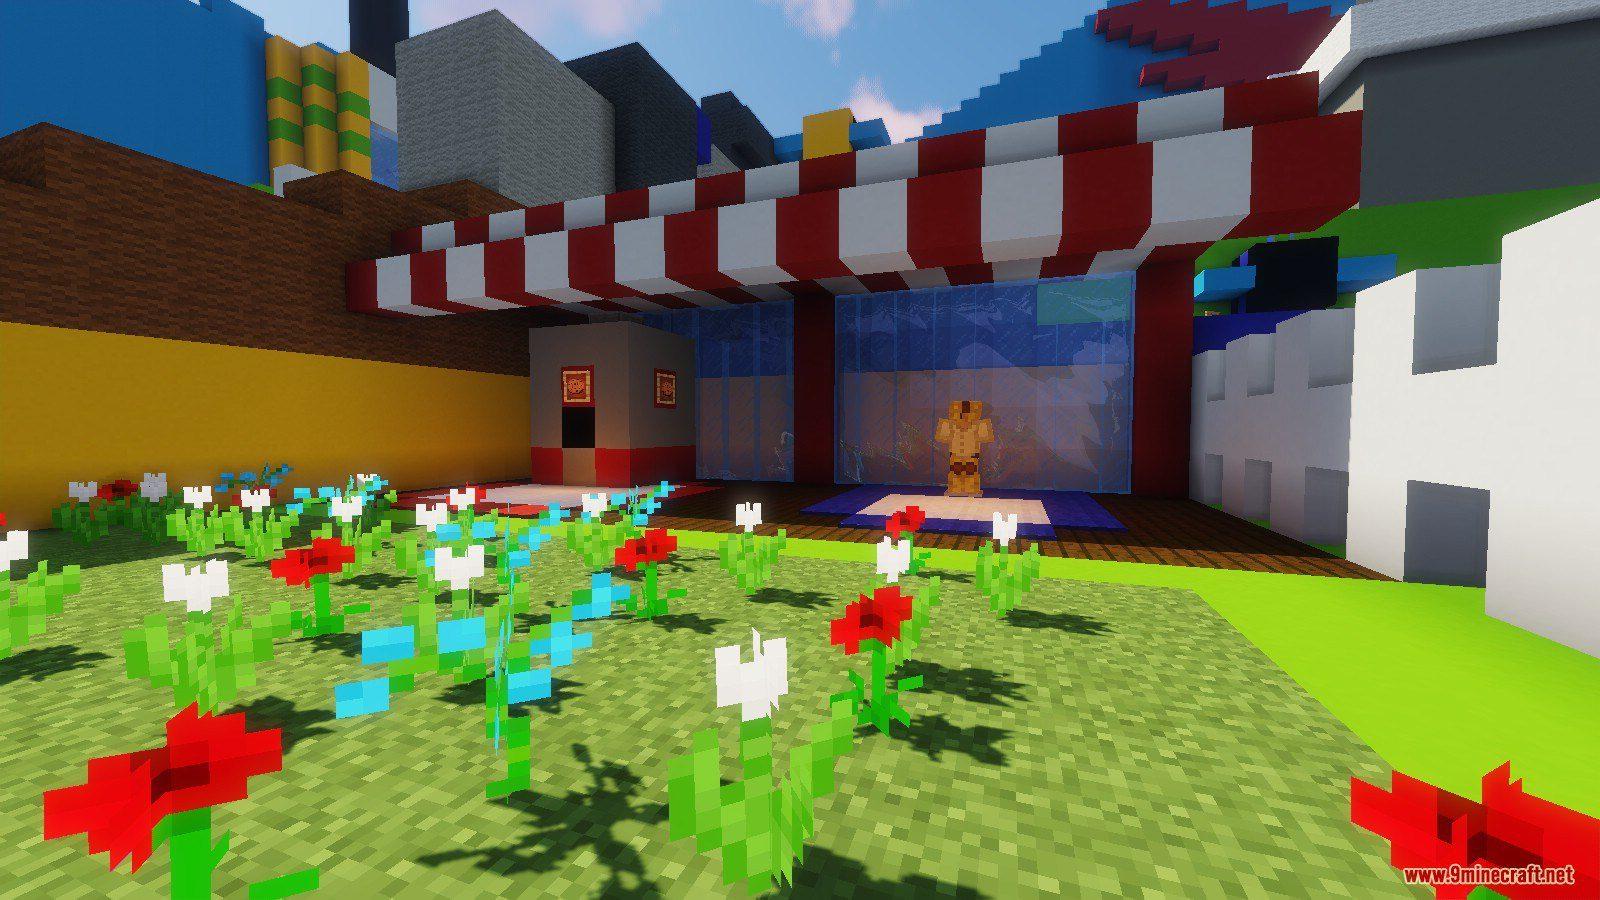 Bee Swarm Simulator Map 1 13 2 for Minecraft - 9Minecraft Net